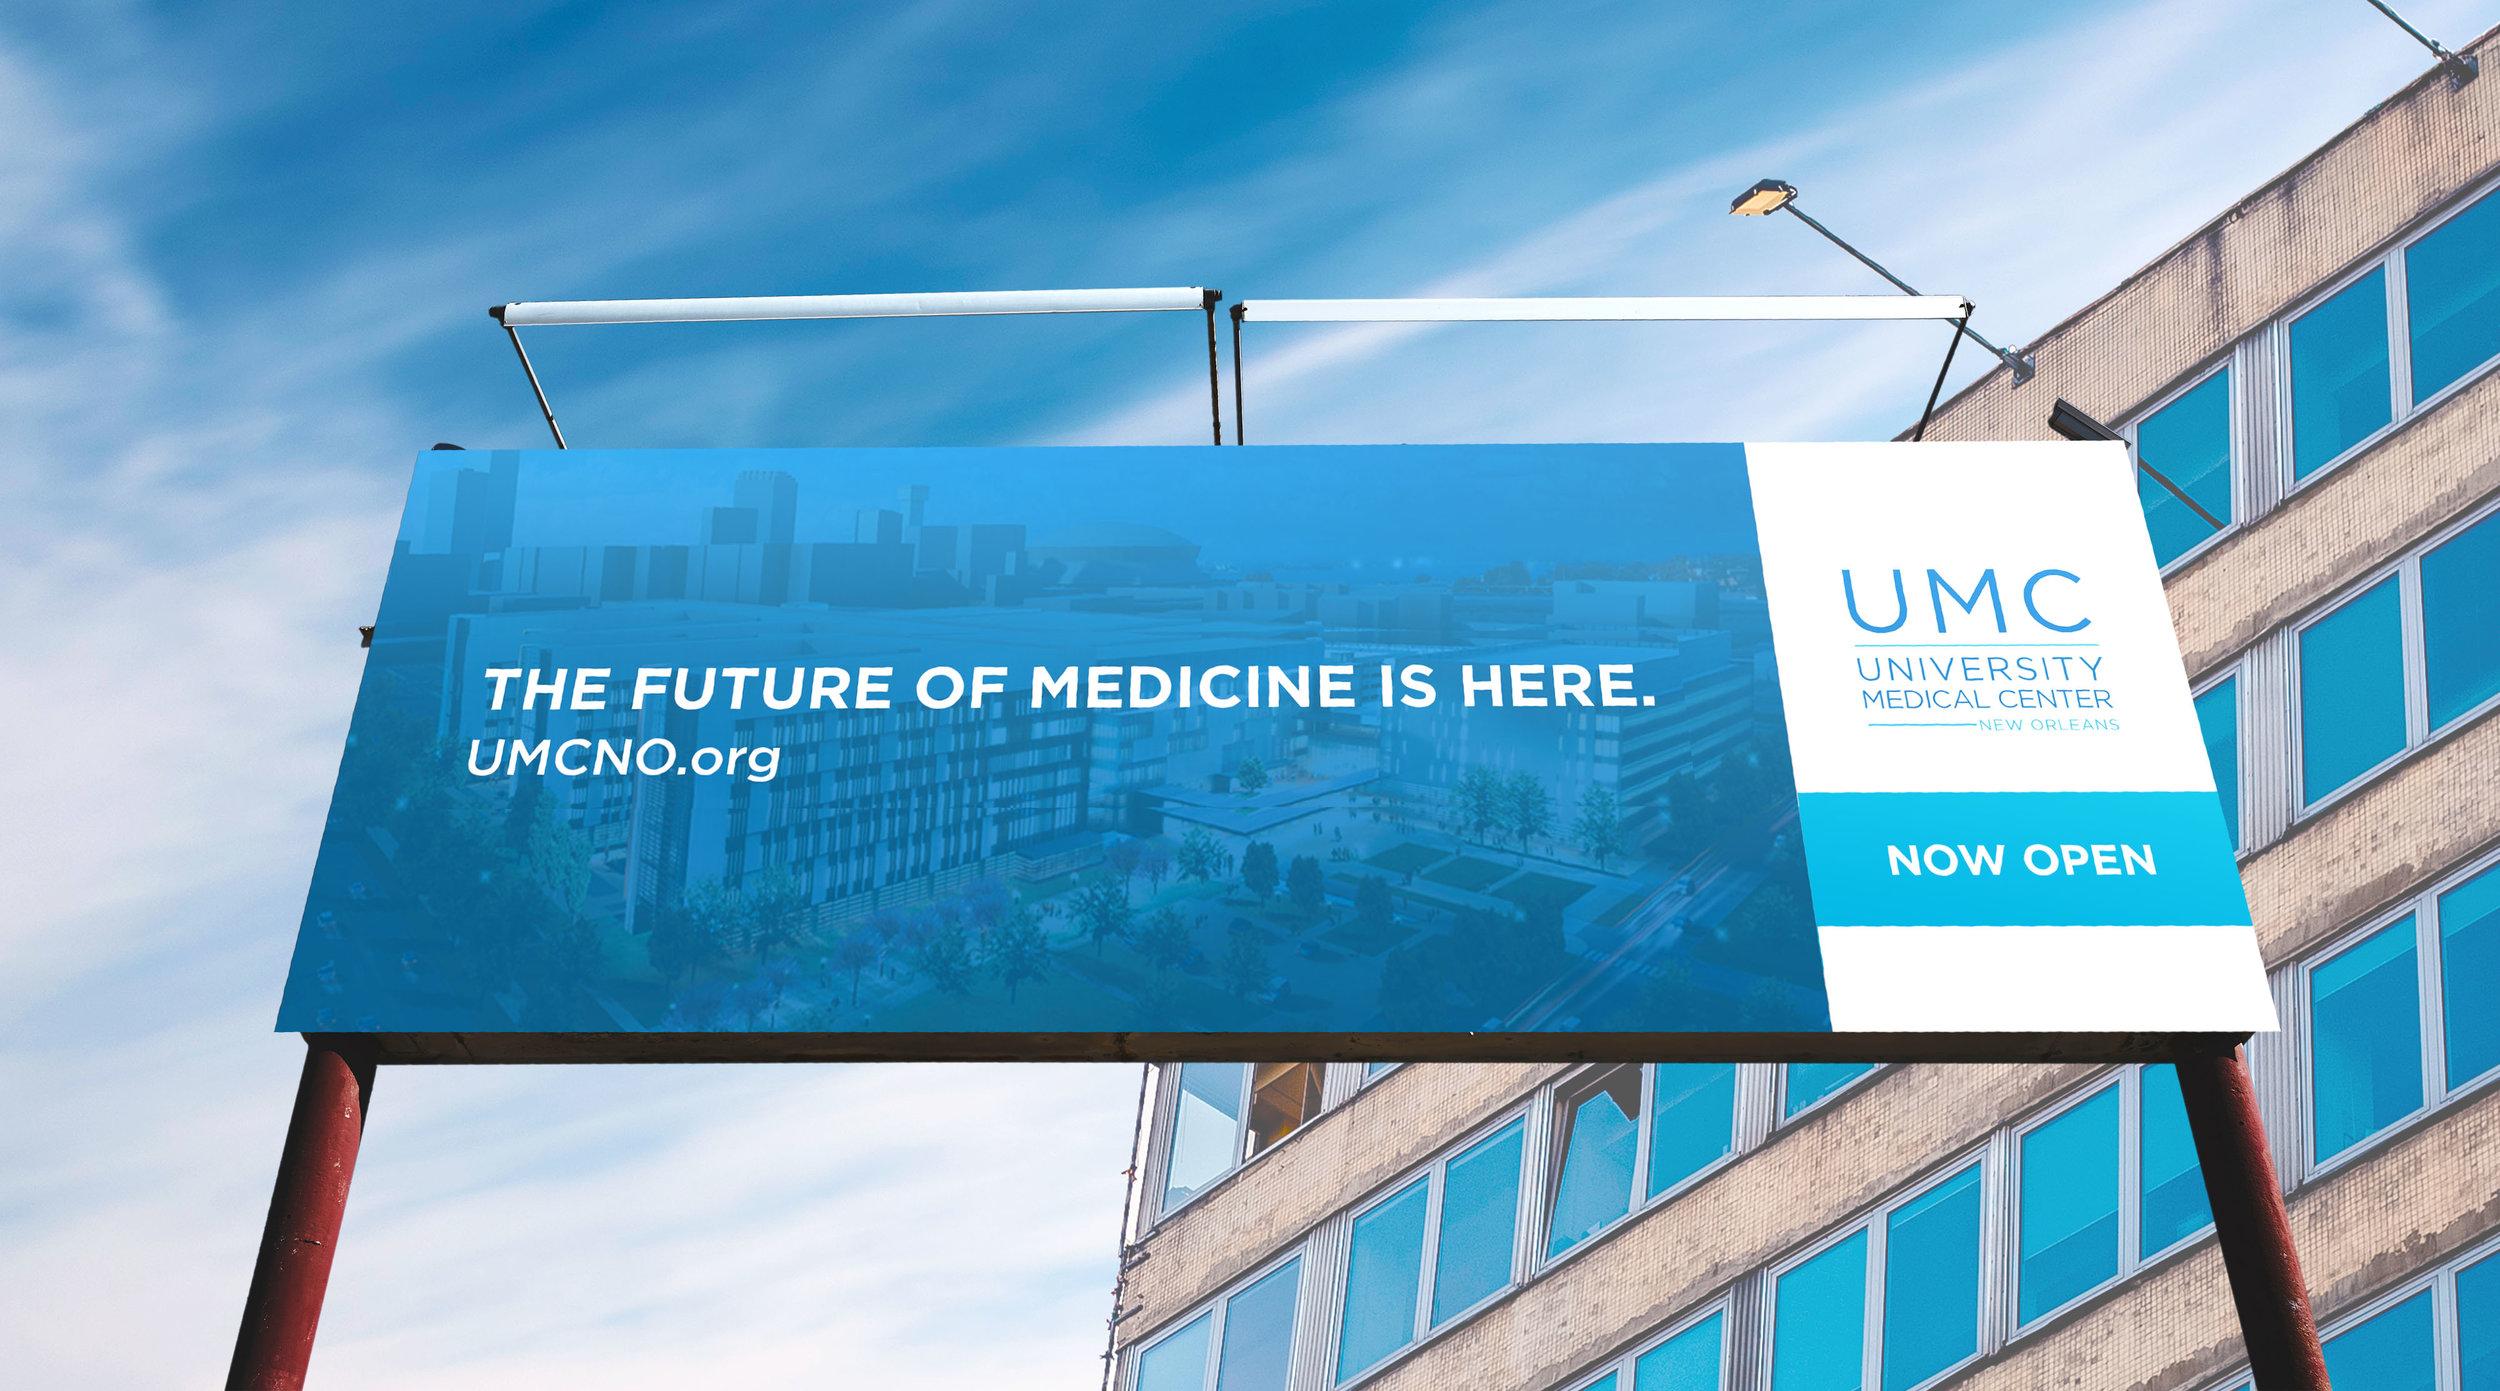 UMC_BillboardMockup_3.jpg